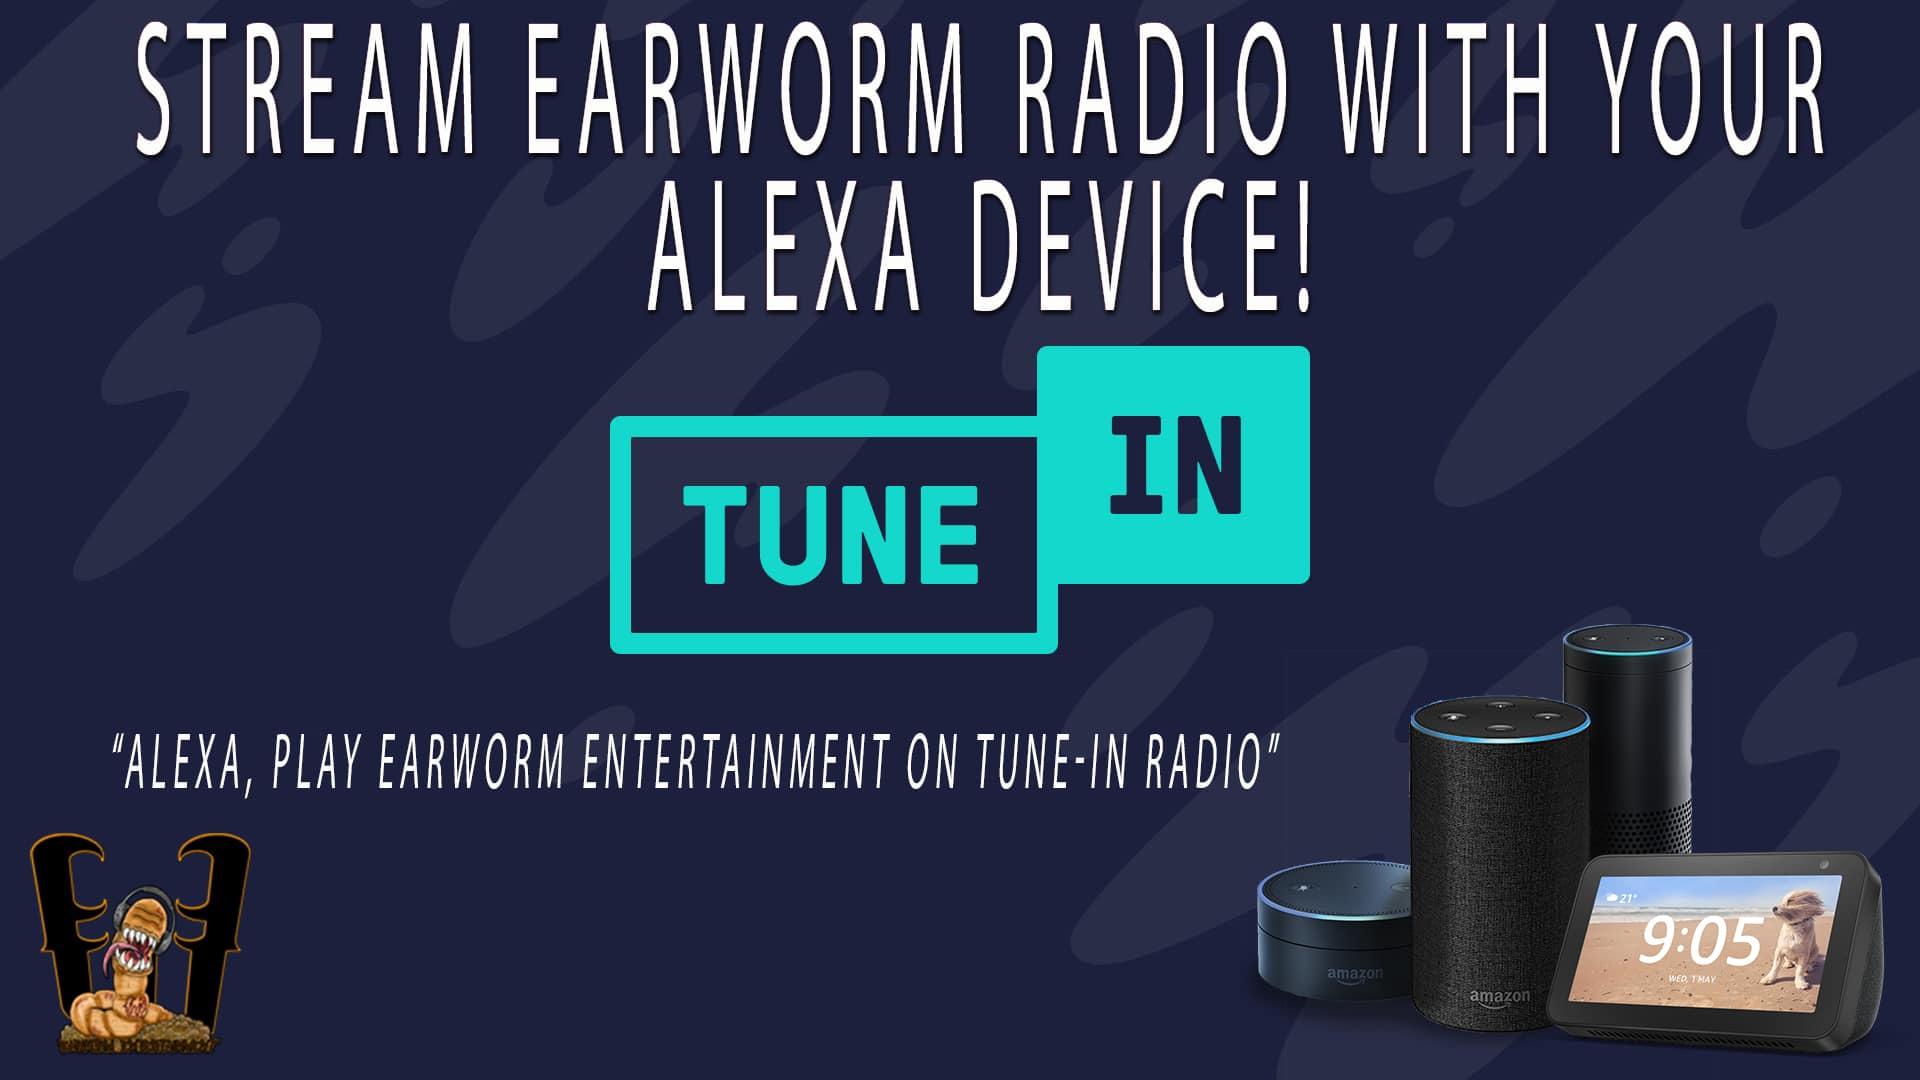 Use Your Alexa Device With Earworm Radio